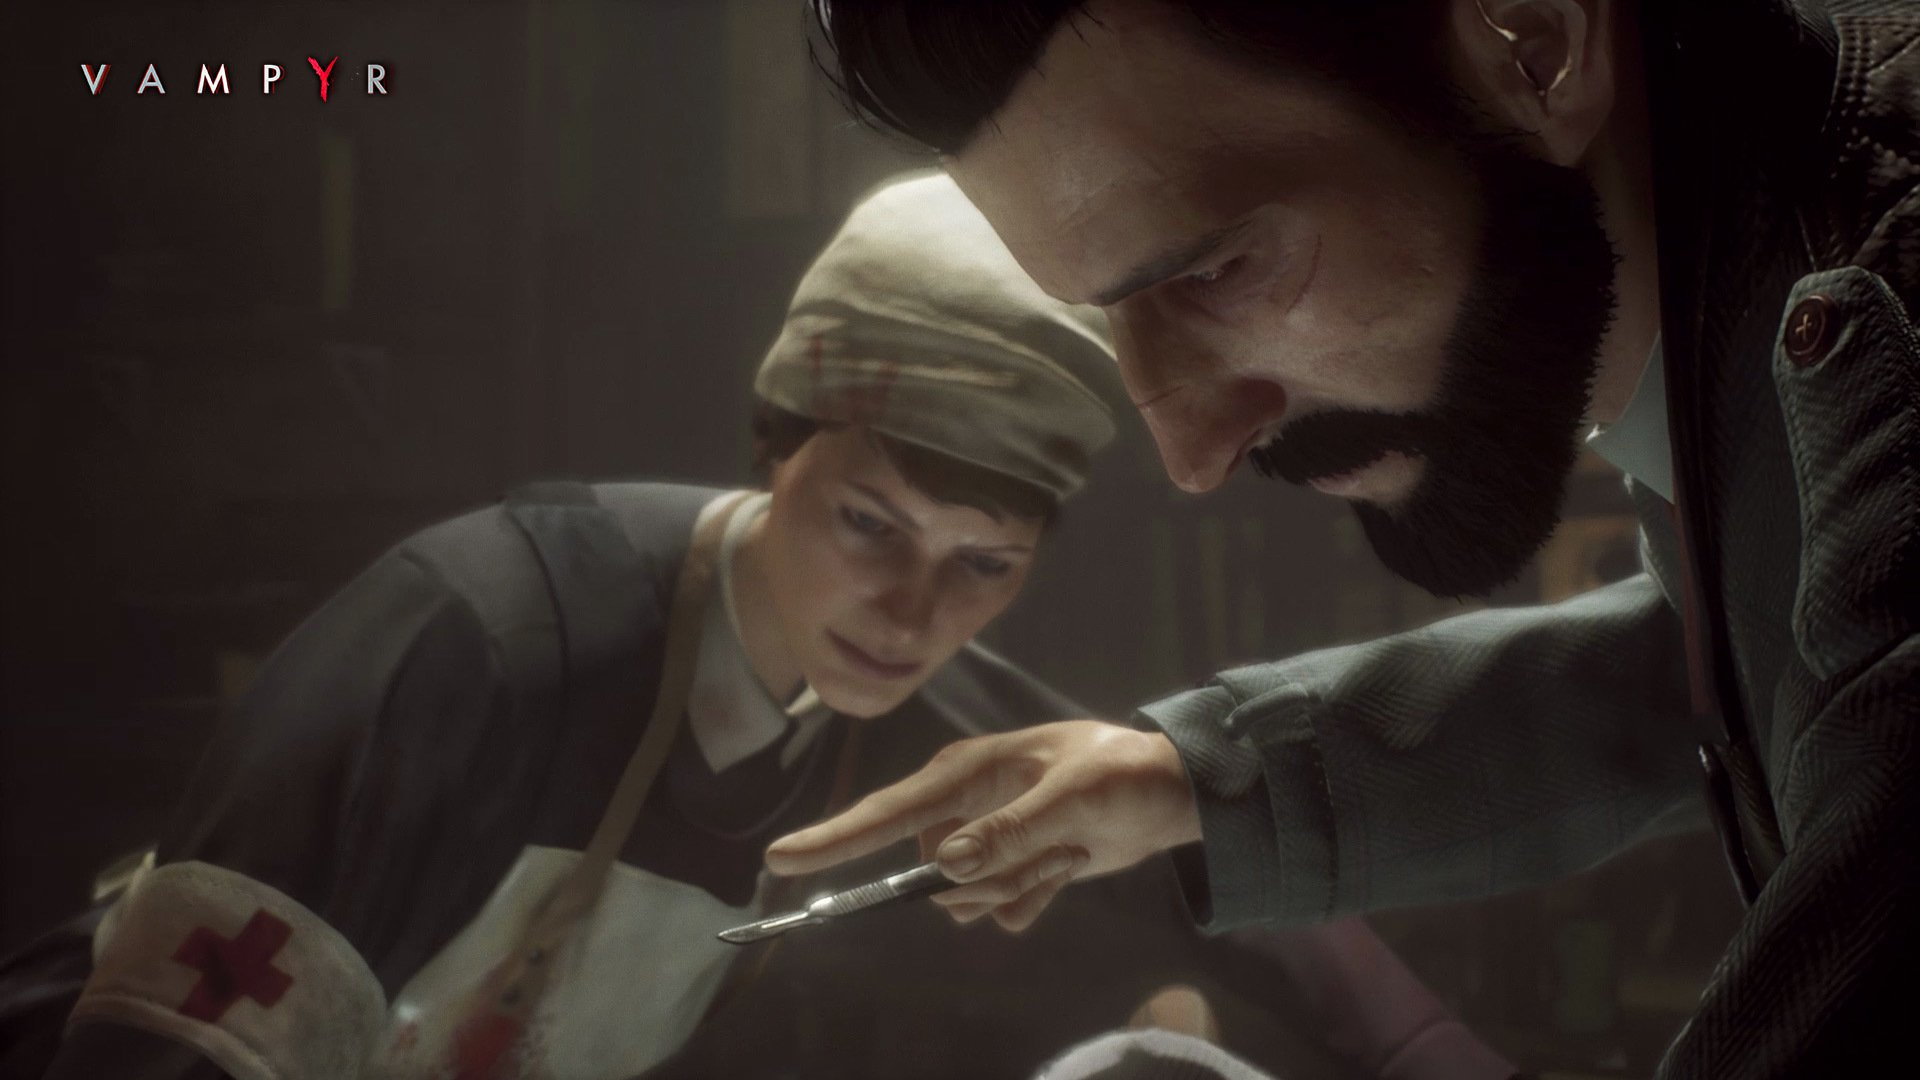 Релизный трейлер игры Vampyr